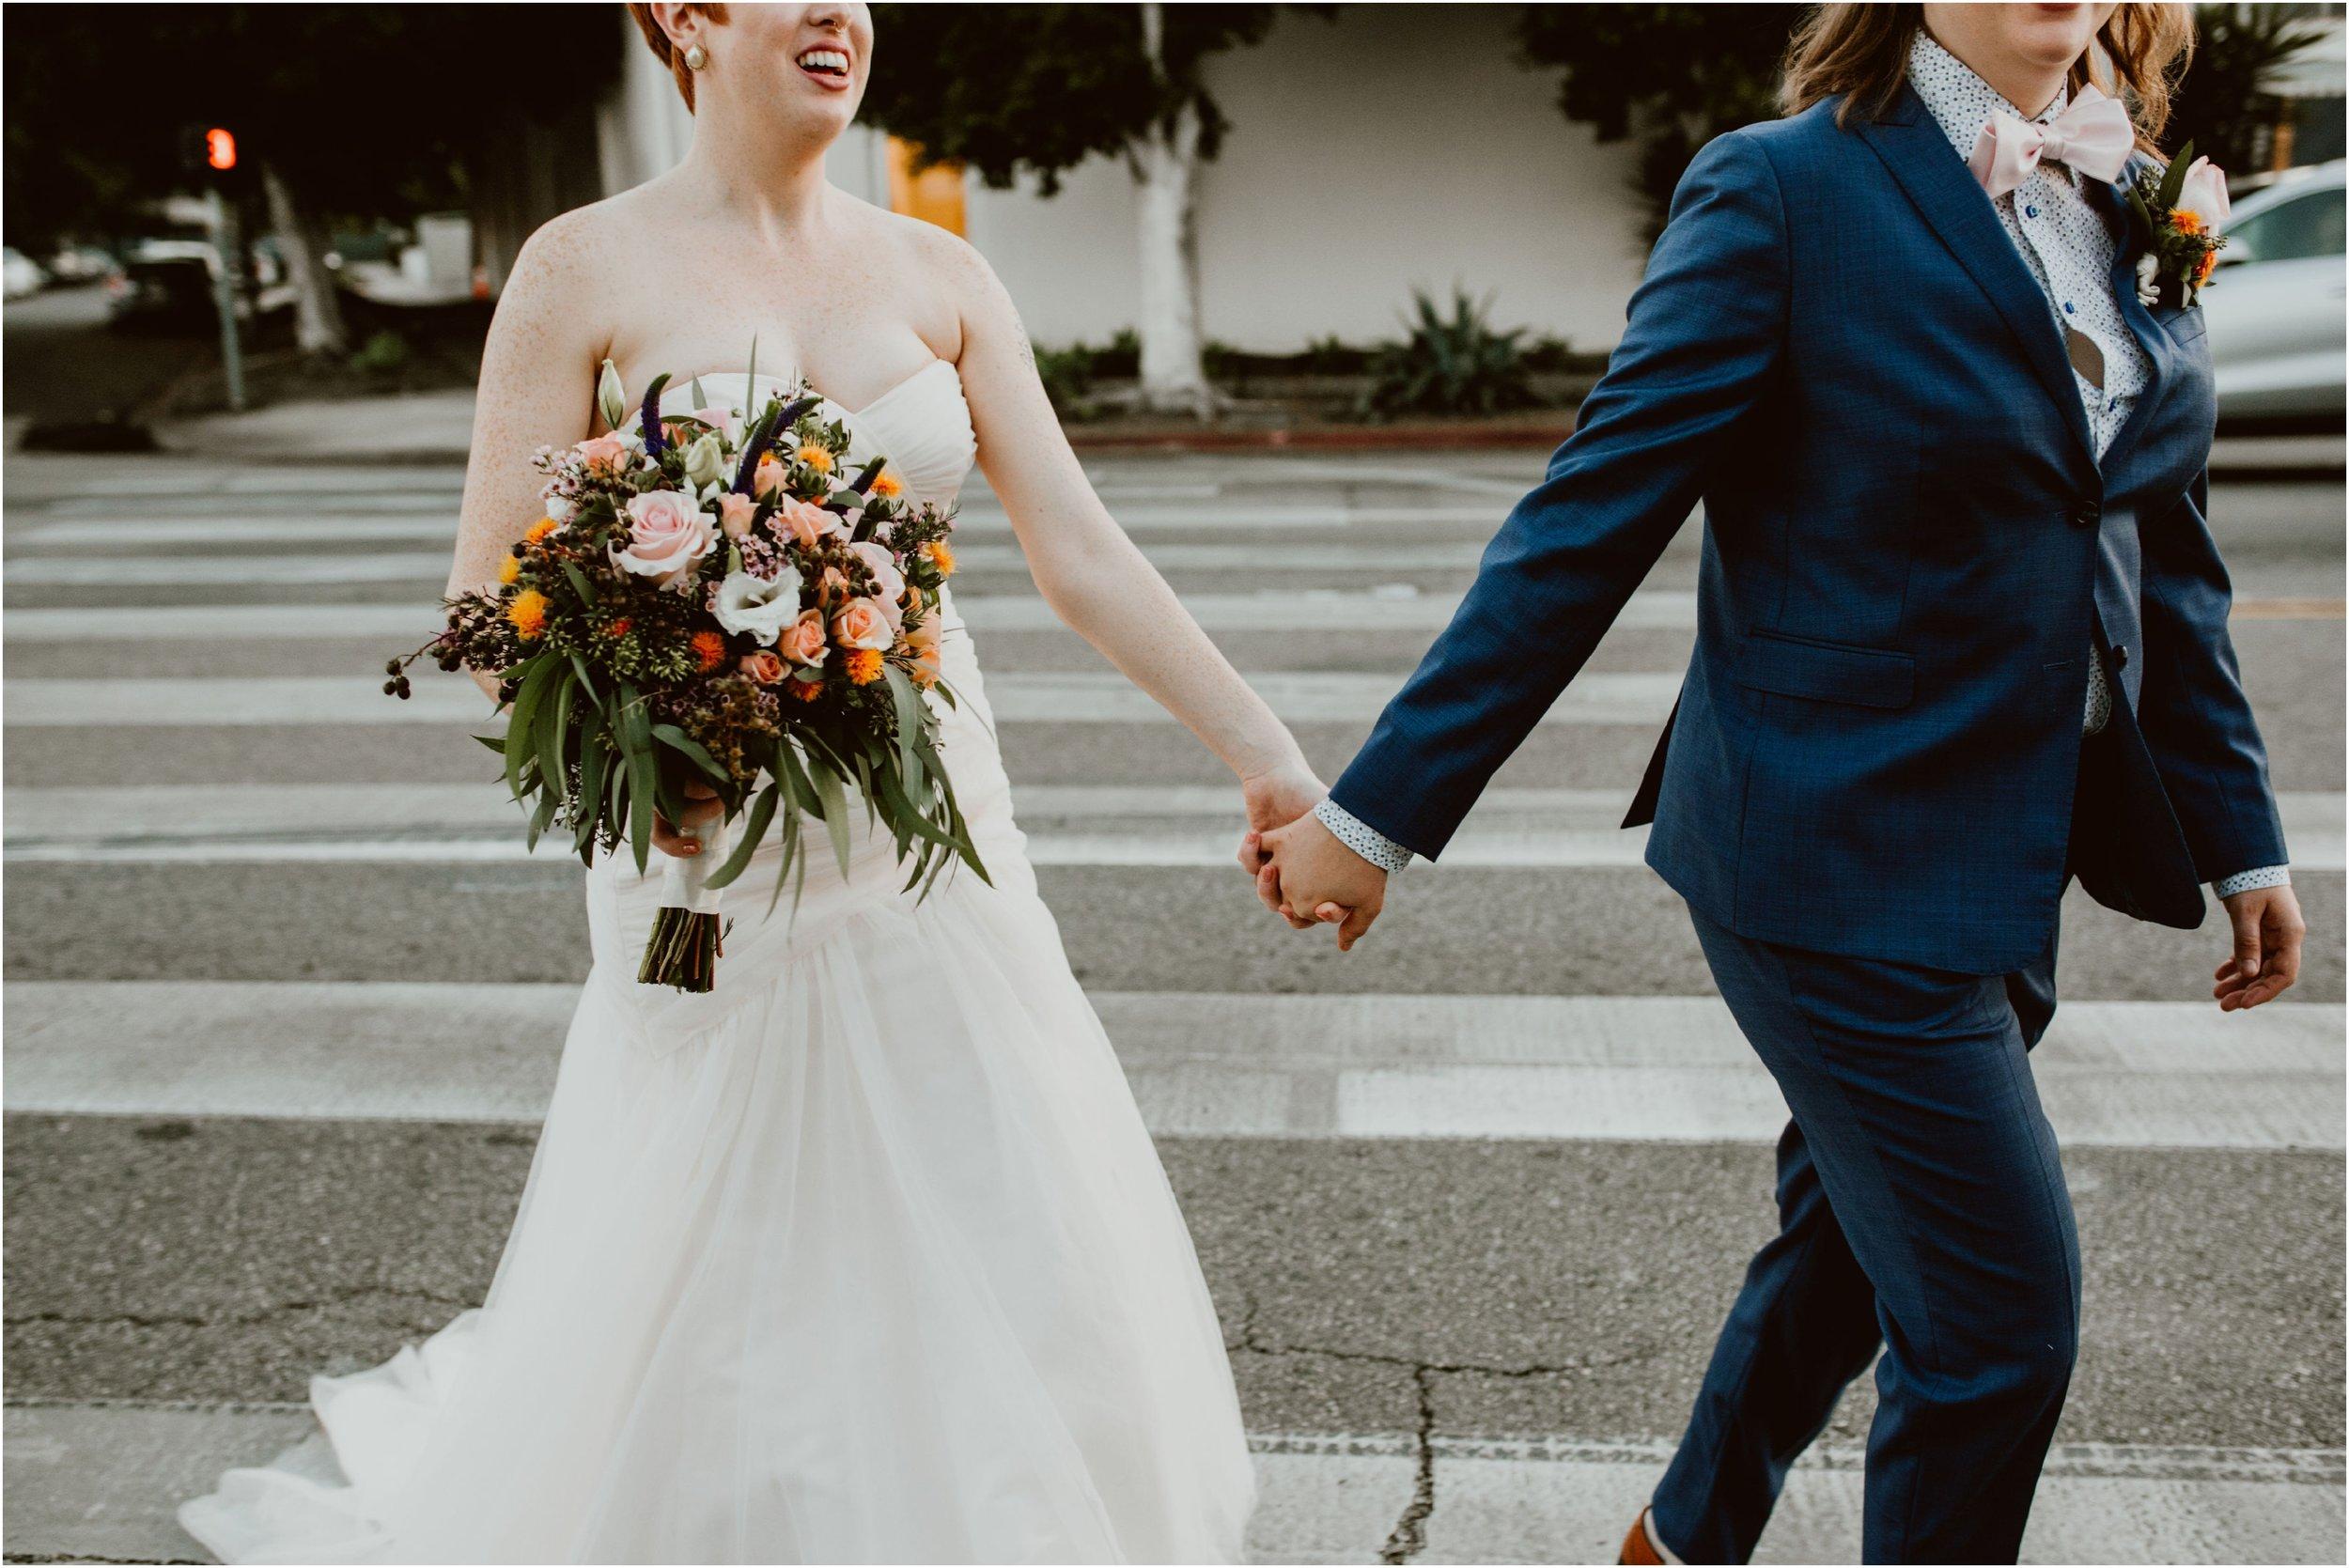 Smogshoppe-Wedding-S+C-Diana-Lake-Photography-790.jpg